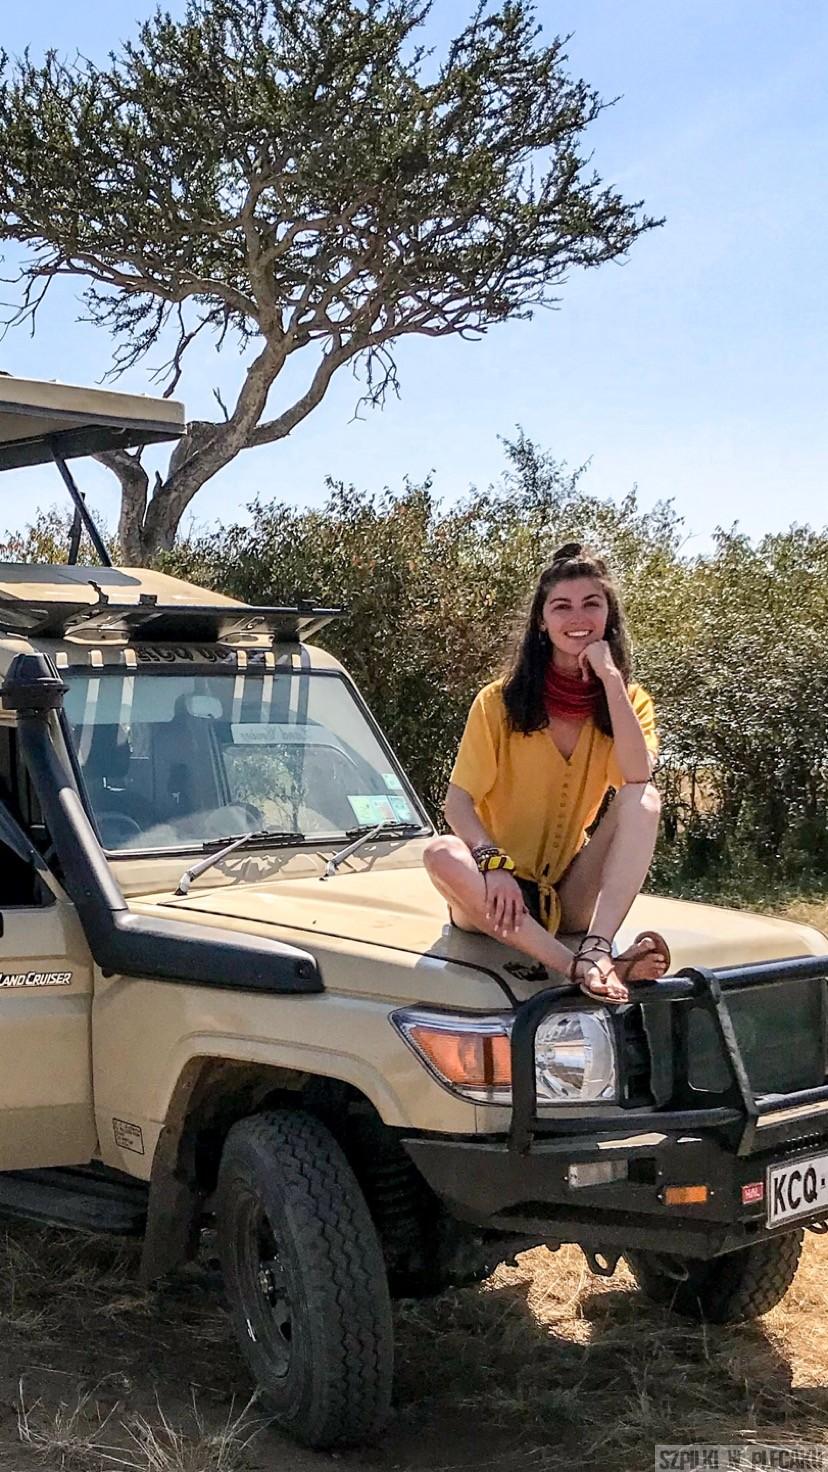 safari w afryce - Kenia - Szpilki w plecaku